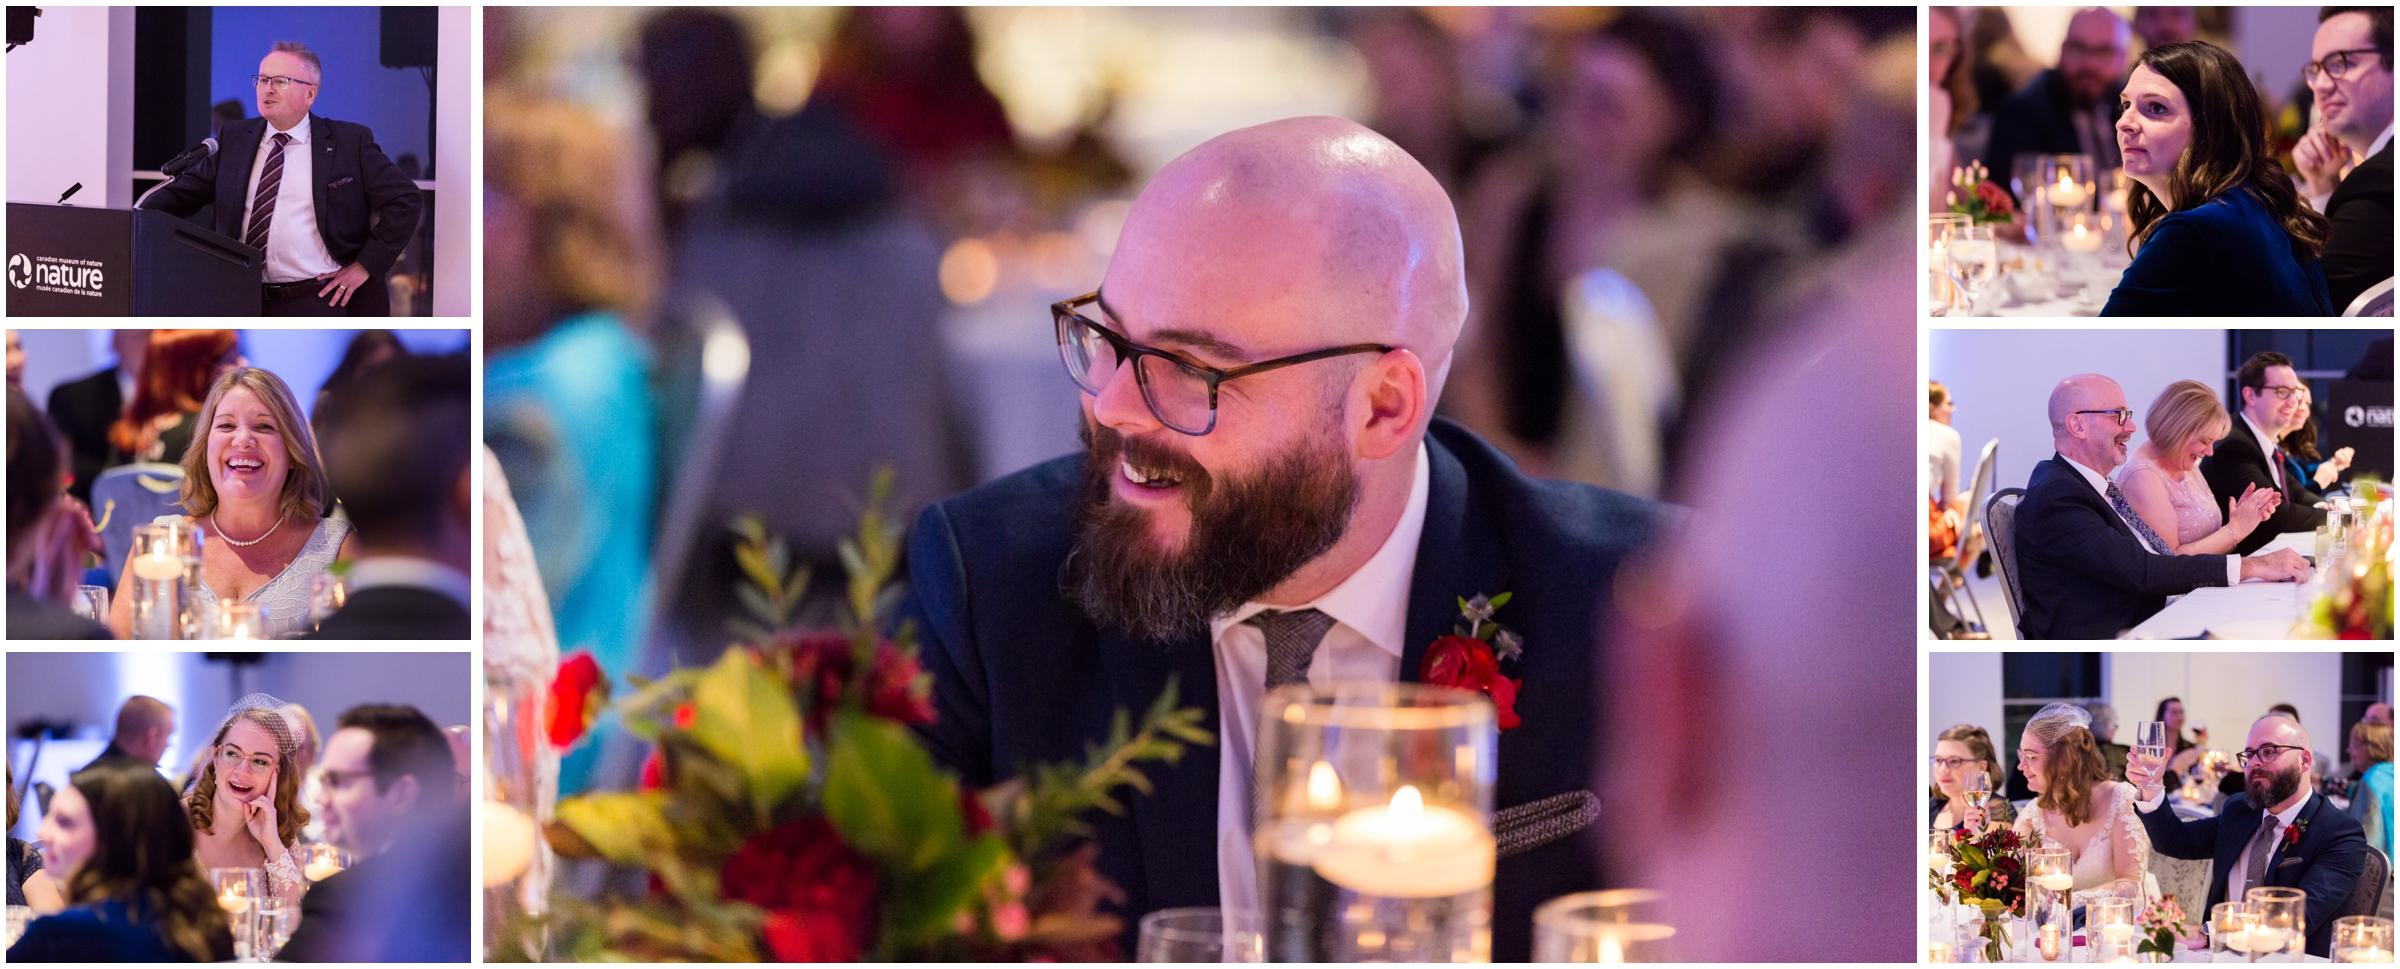 Ottaw Wedding Allison Andrew - (Selena Phillips-Boyle)_0087.jpg